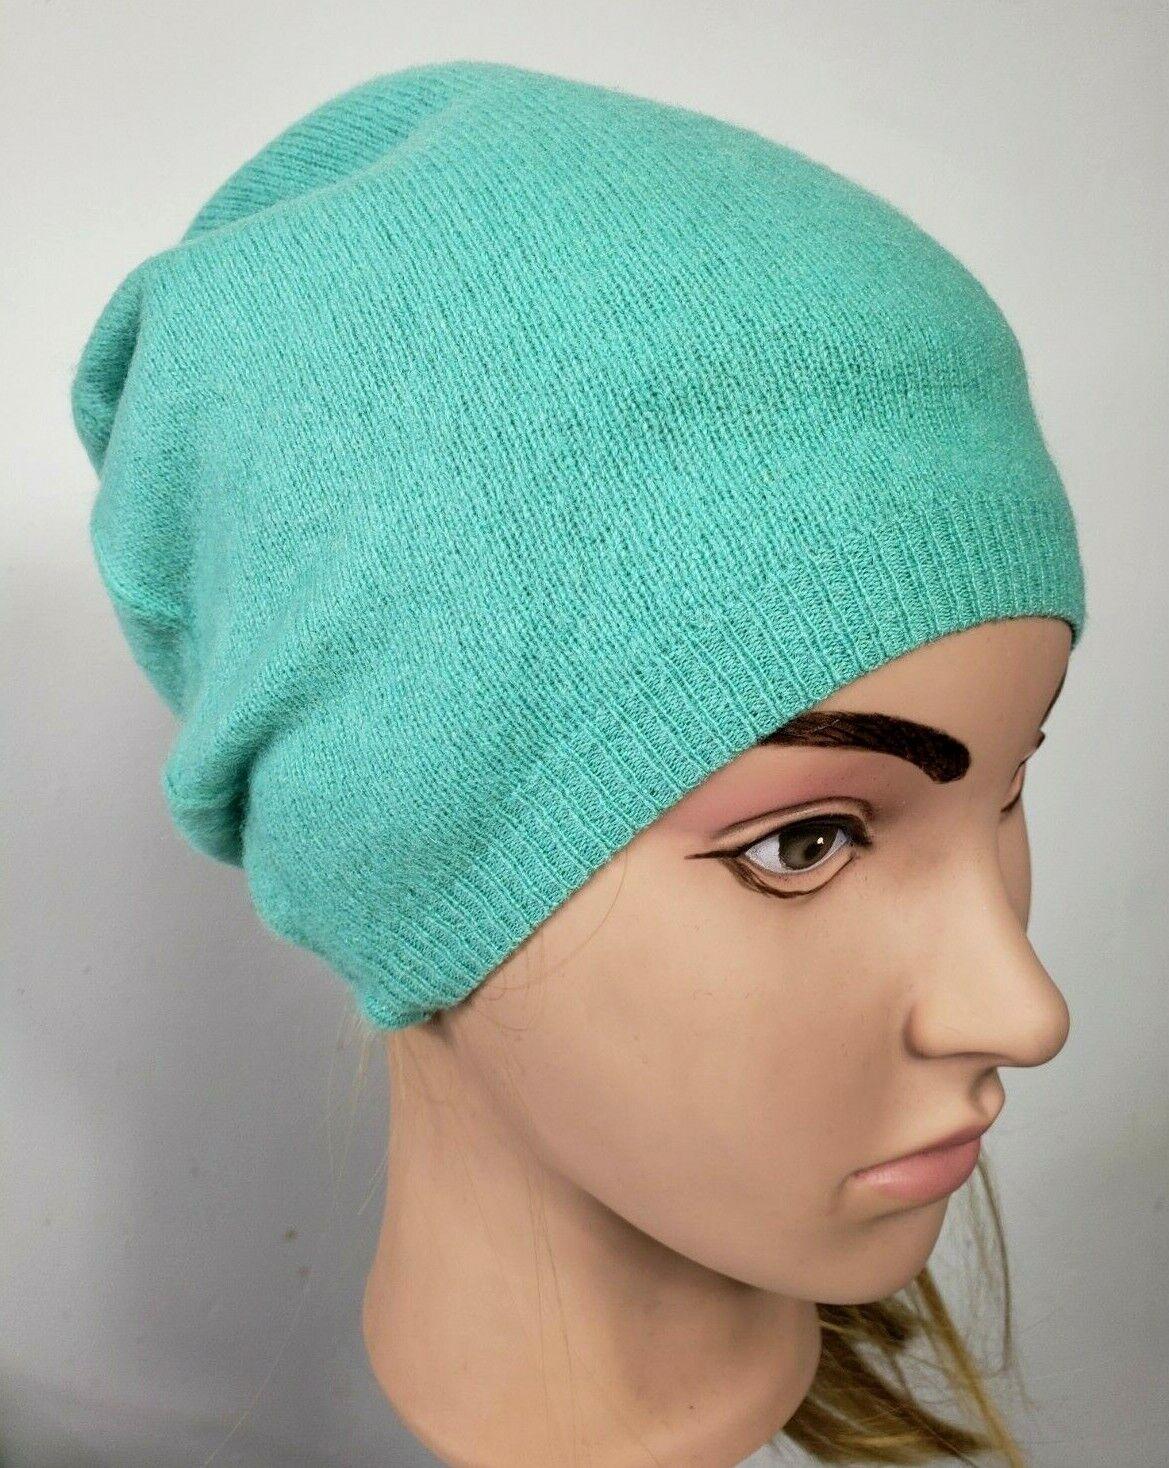 # 100% Pure Cashmere Sombrero Gorro de Lana Hombre Mujer Unisex Hecho a Mano Como Nuevo Azul 256